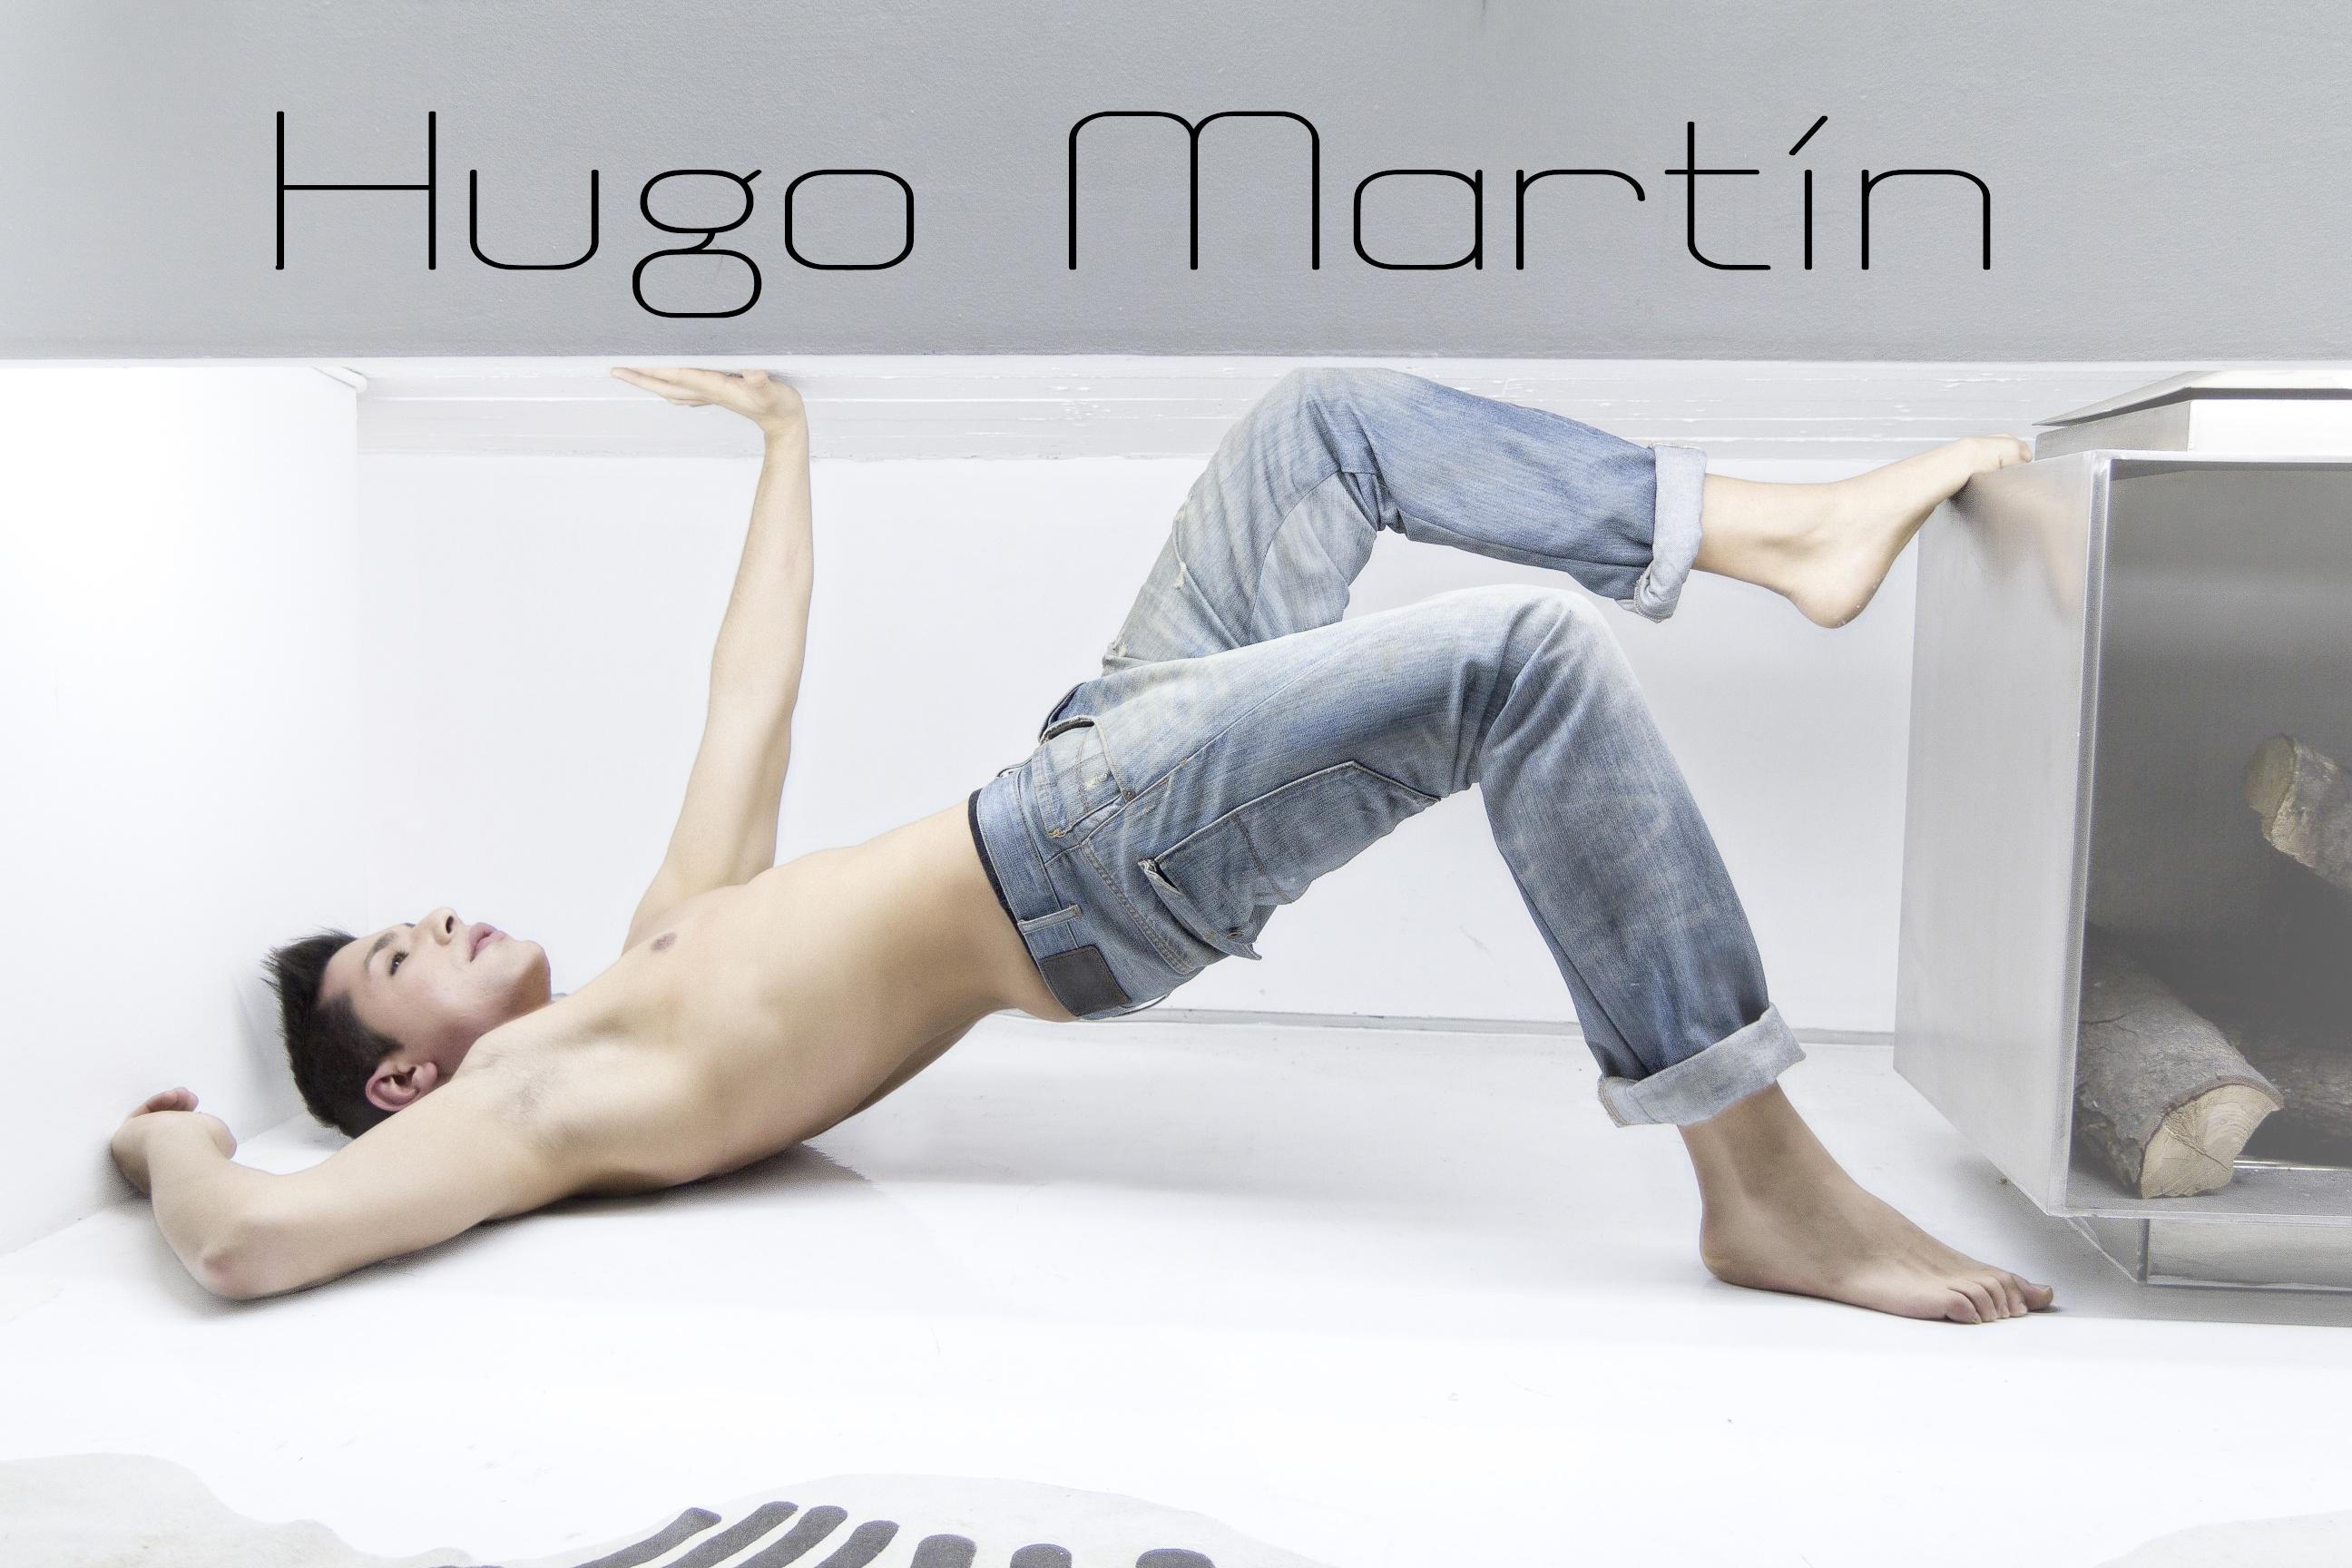 Modelo: Hugo Martín